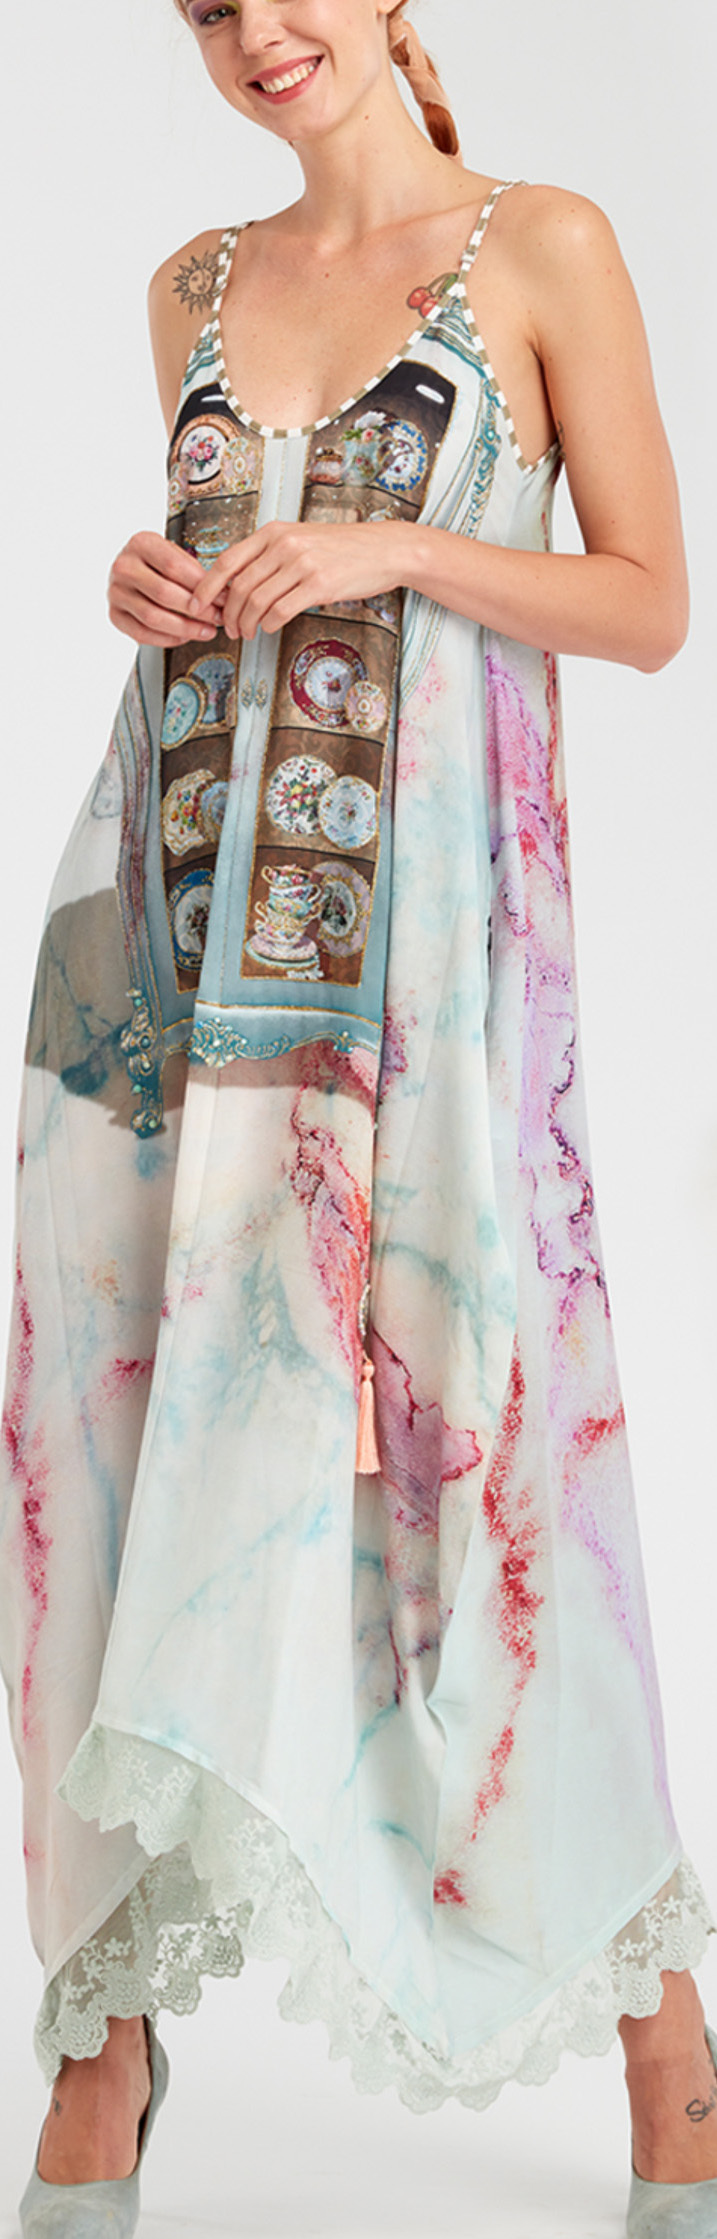 IPNG: Inna Me Rose Reflection Illusion V-Cut Maxi Dress IPNG_TIMDVN-035